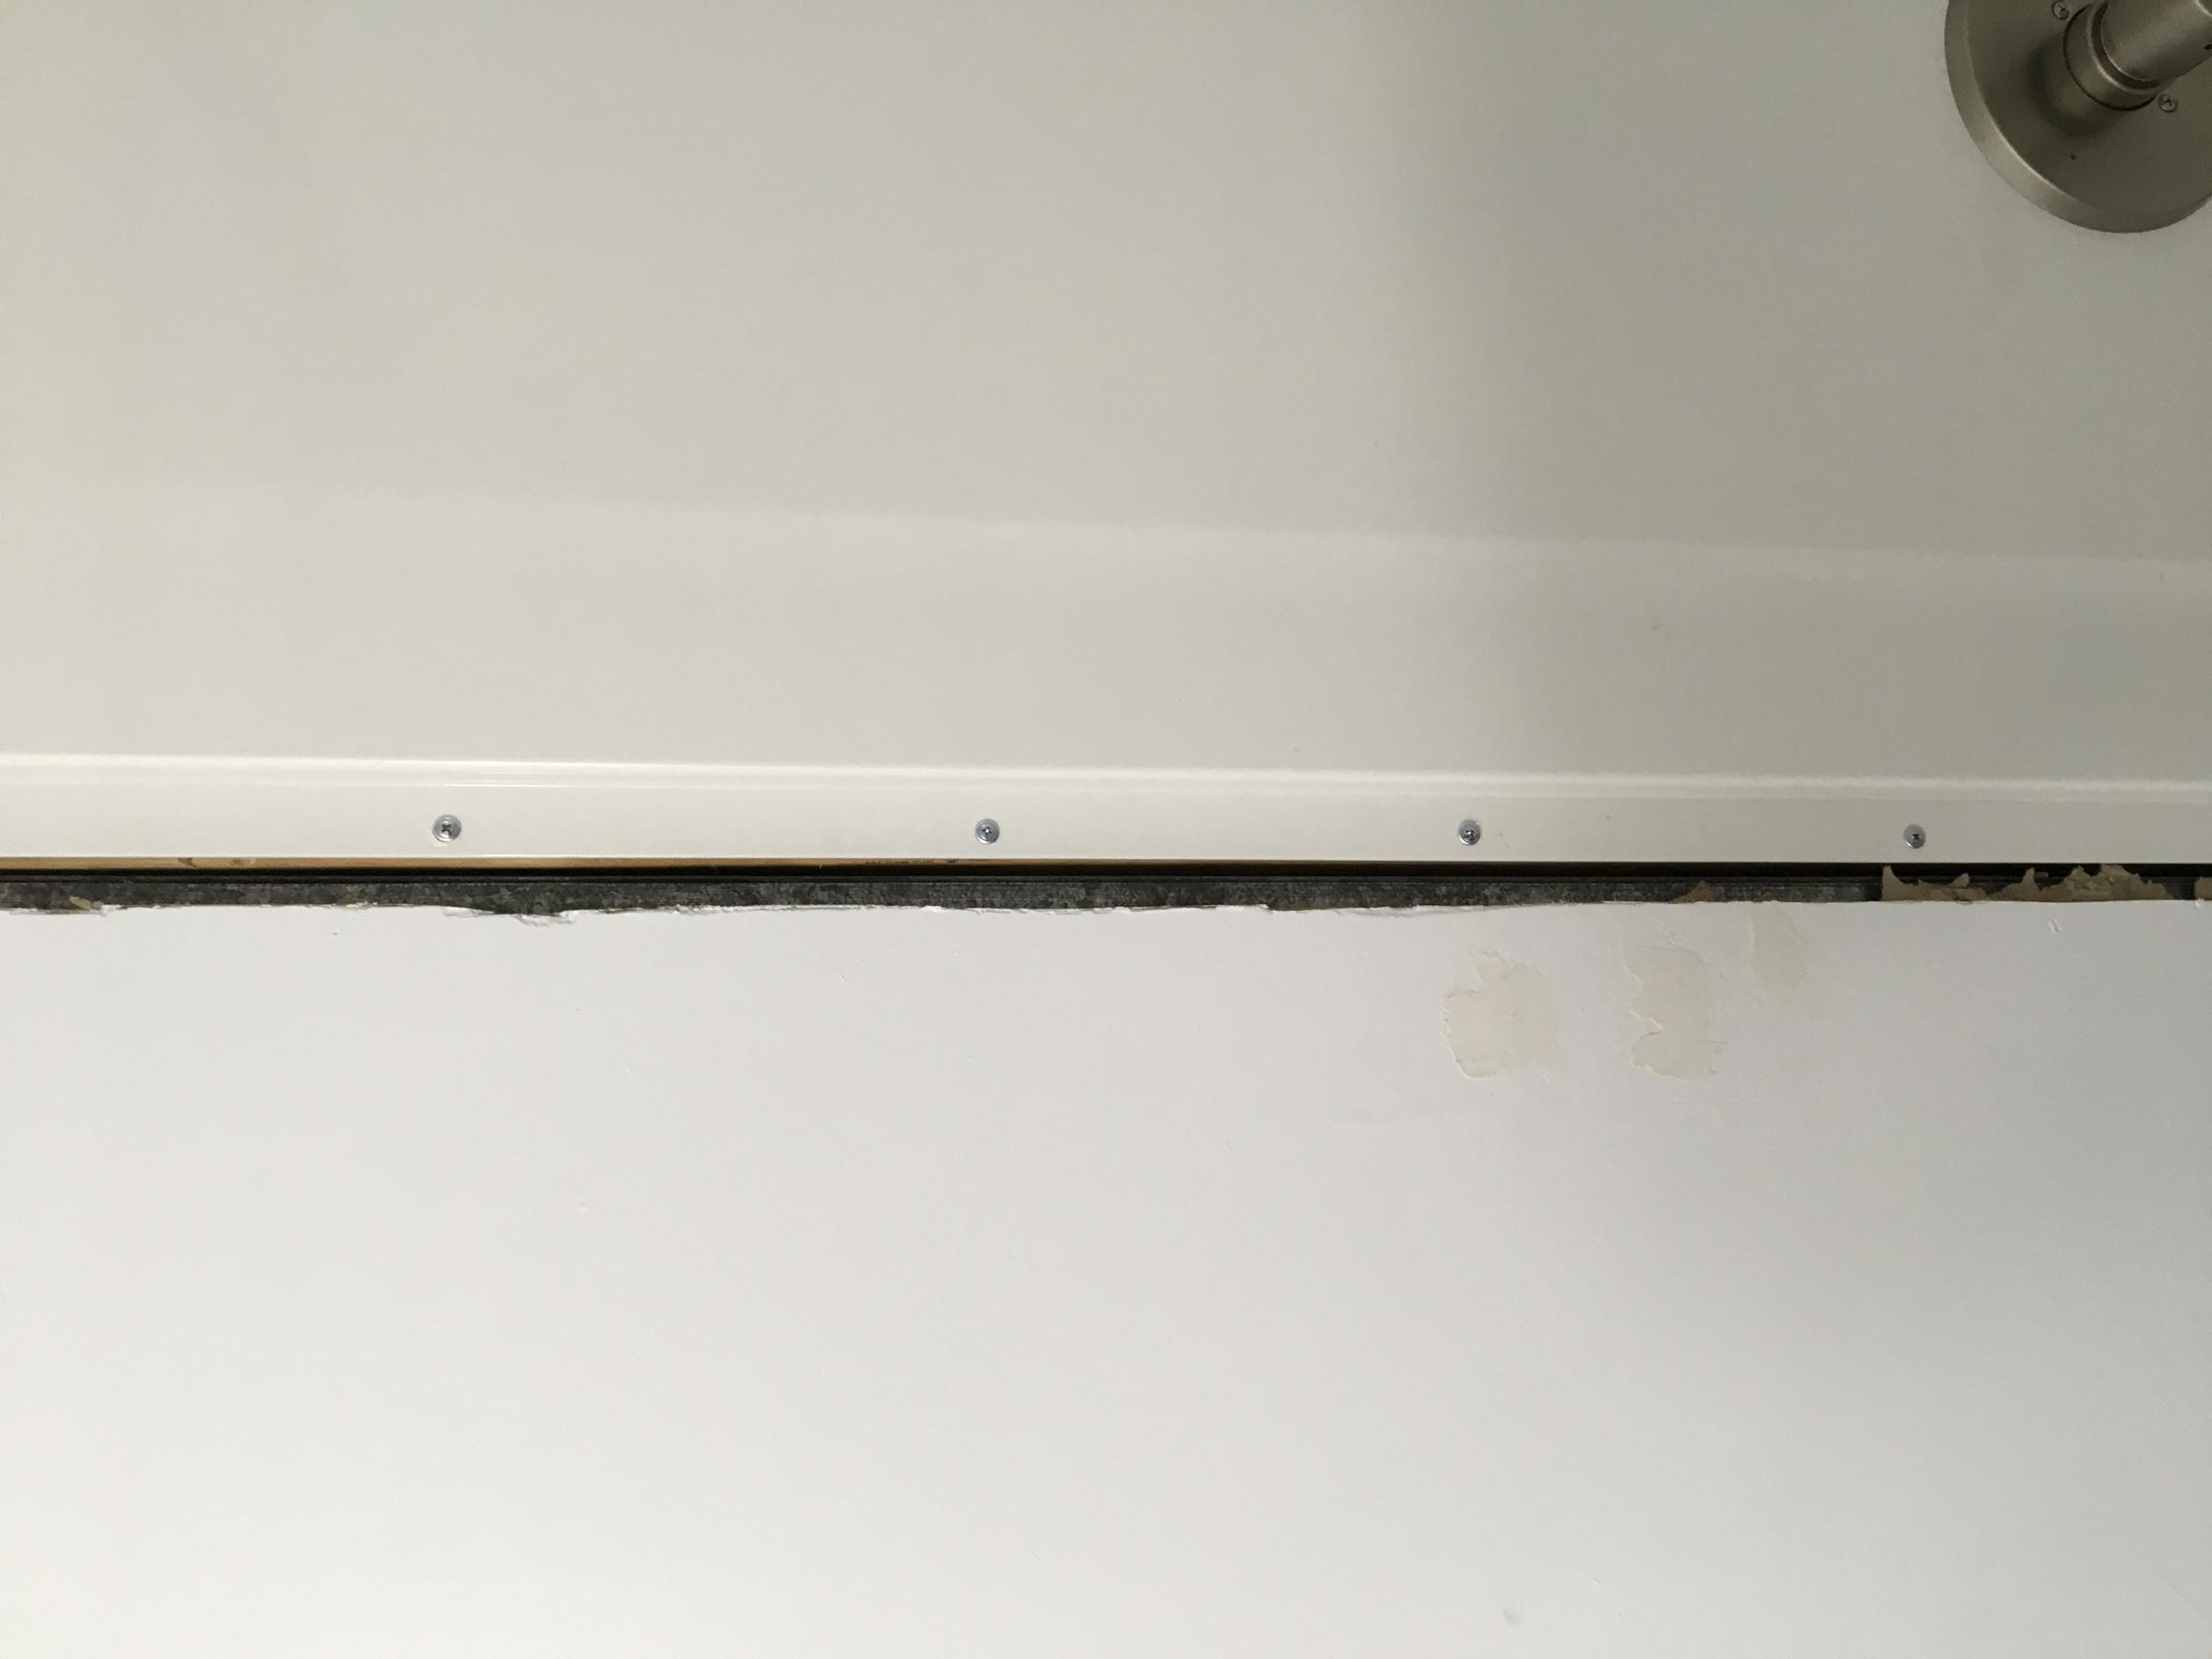 Impossible drywall around tub surround-b74f9d24-ca45-46e1-a387-7c1846db5725.jpg